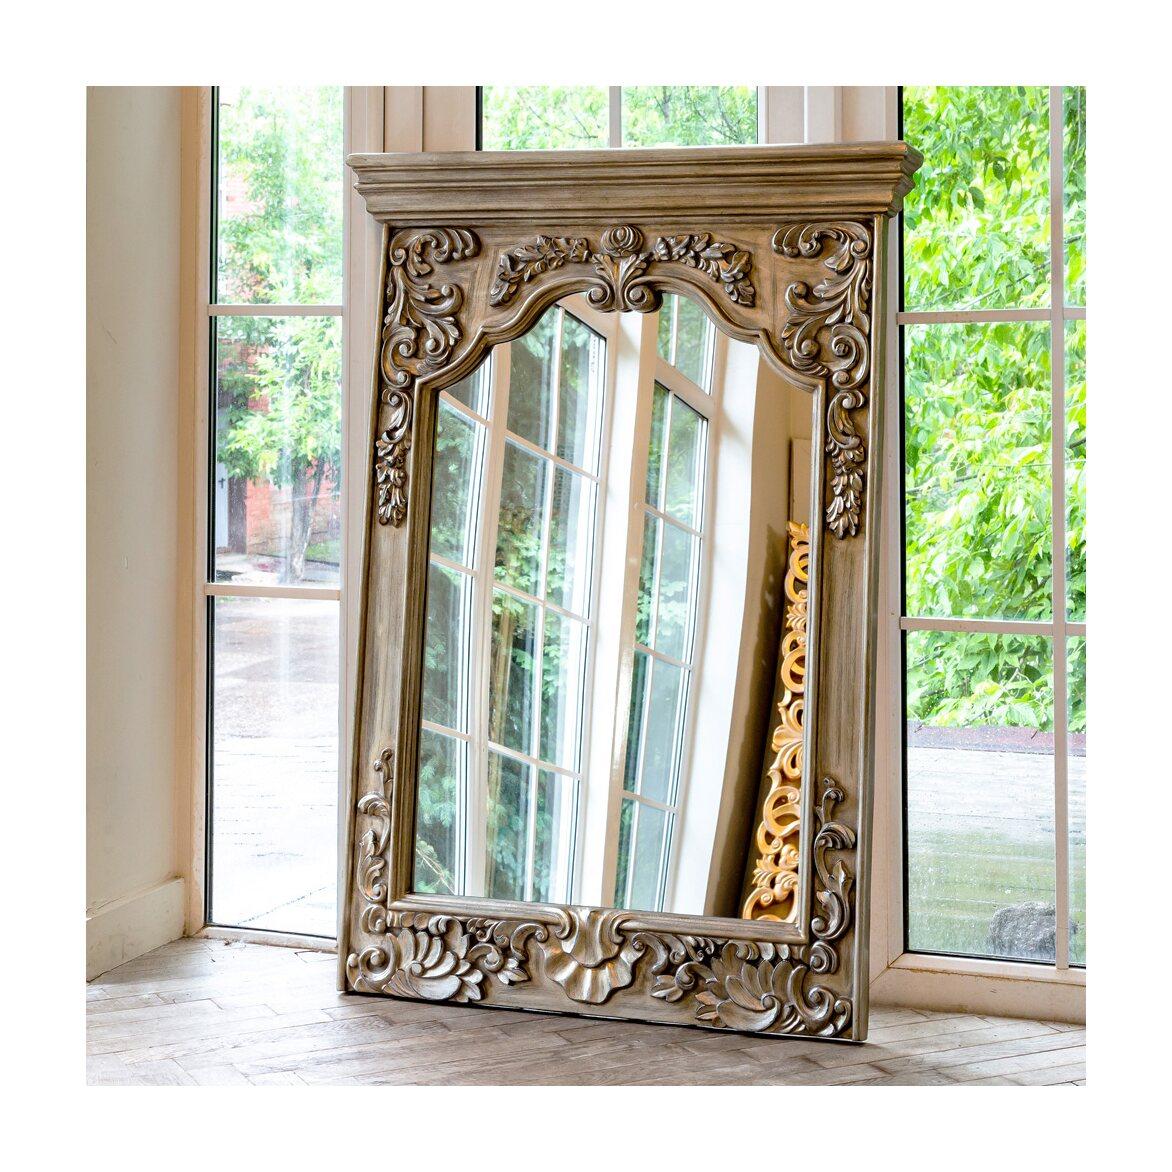 Настенное зеркало «Синдбад» 2 | Настенные зеркала Kingsby